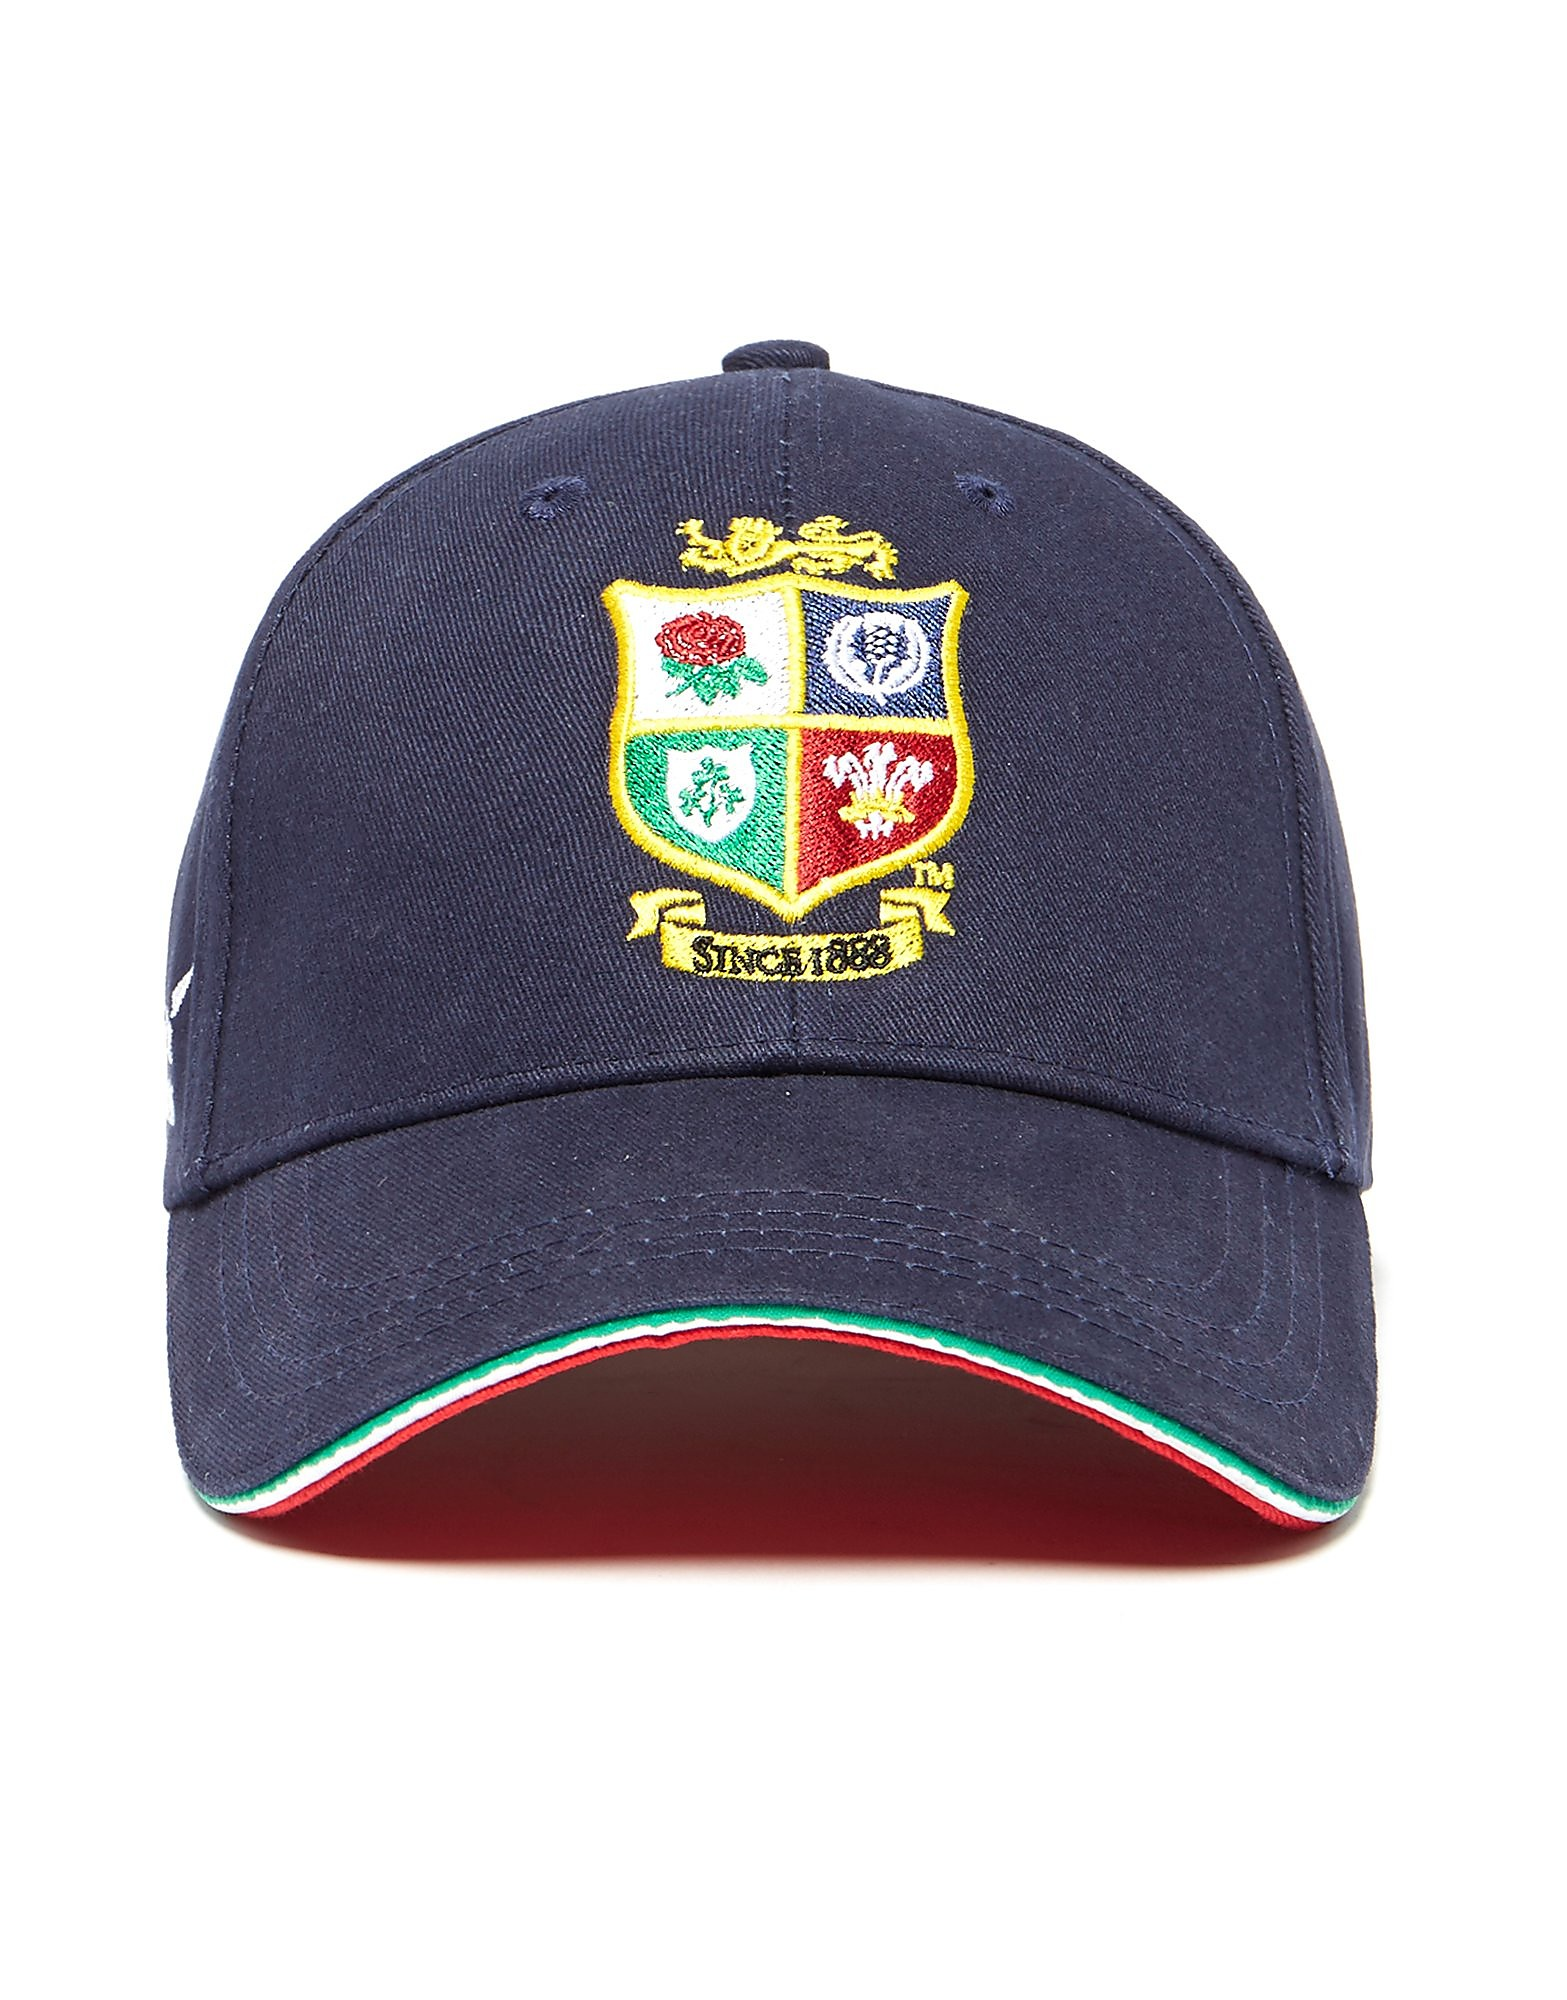 Canterbury British and Irish Lions 2017 Adjustable Cap